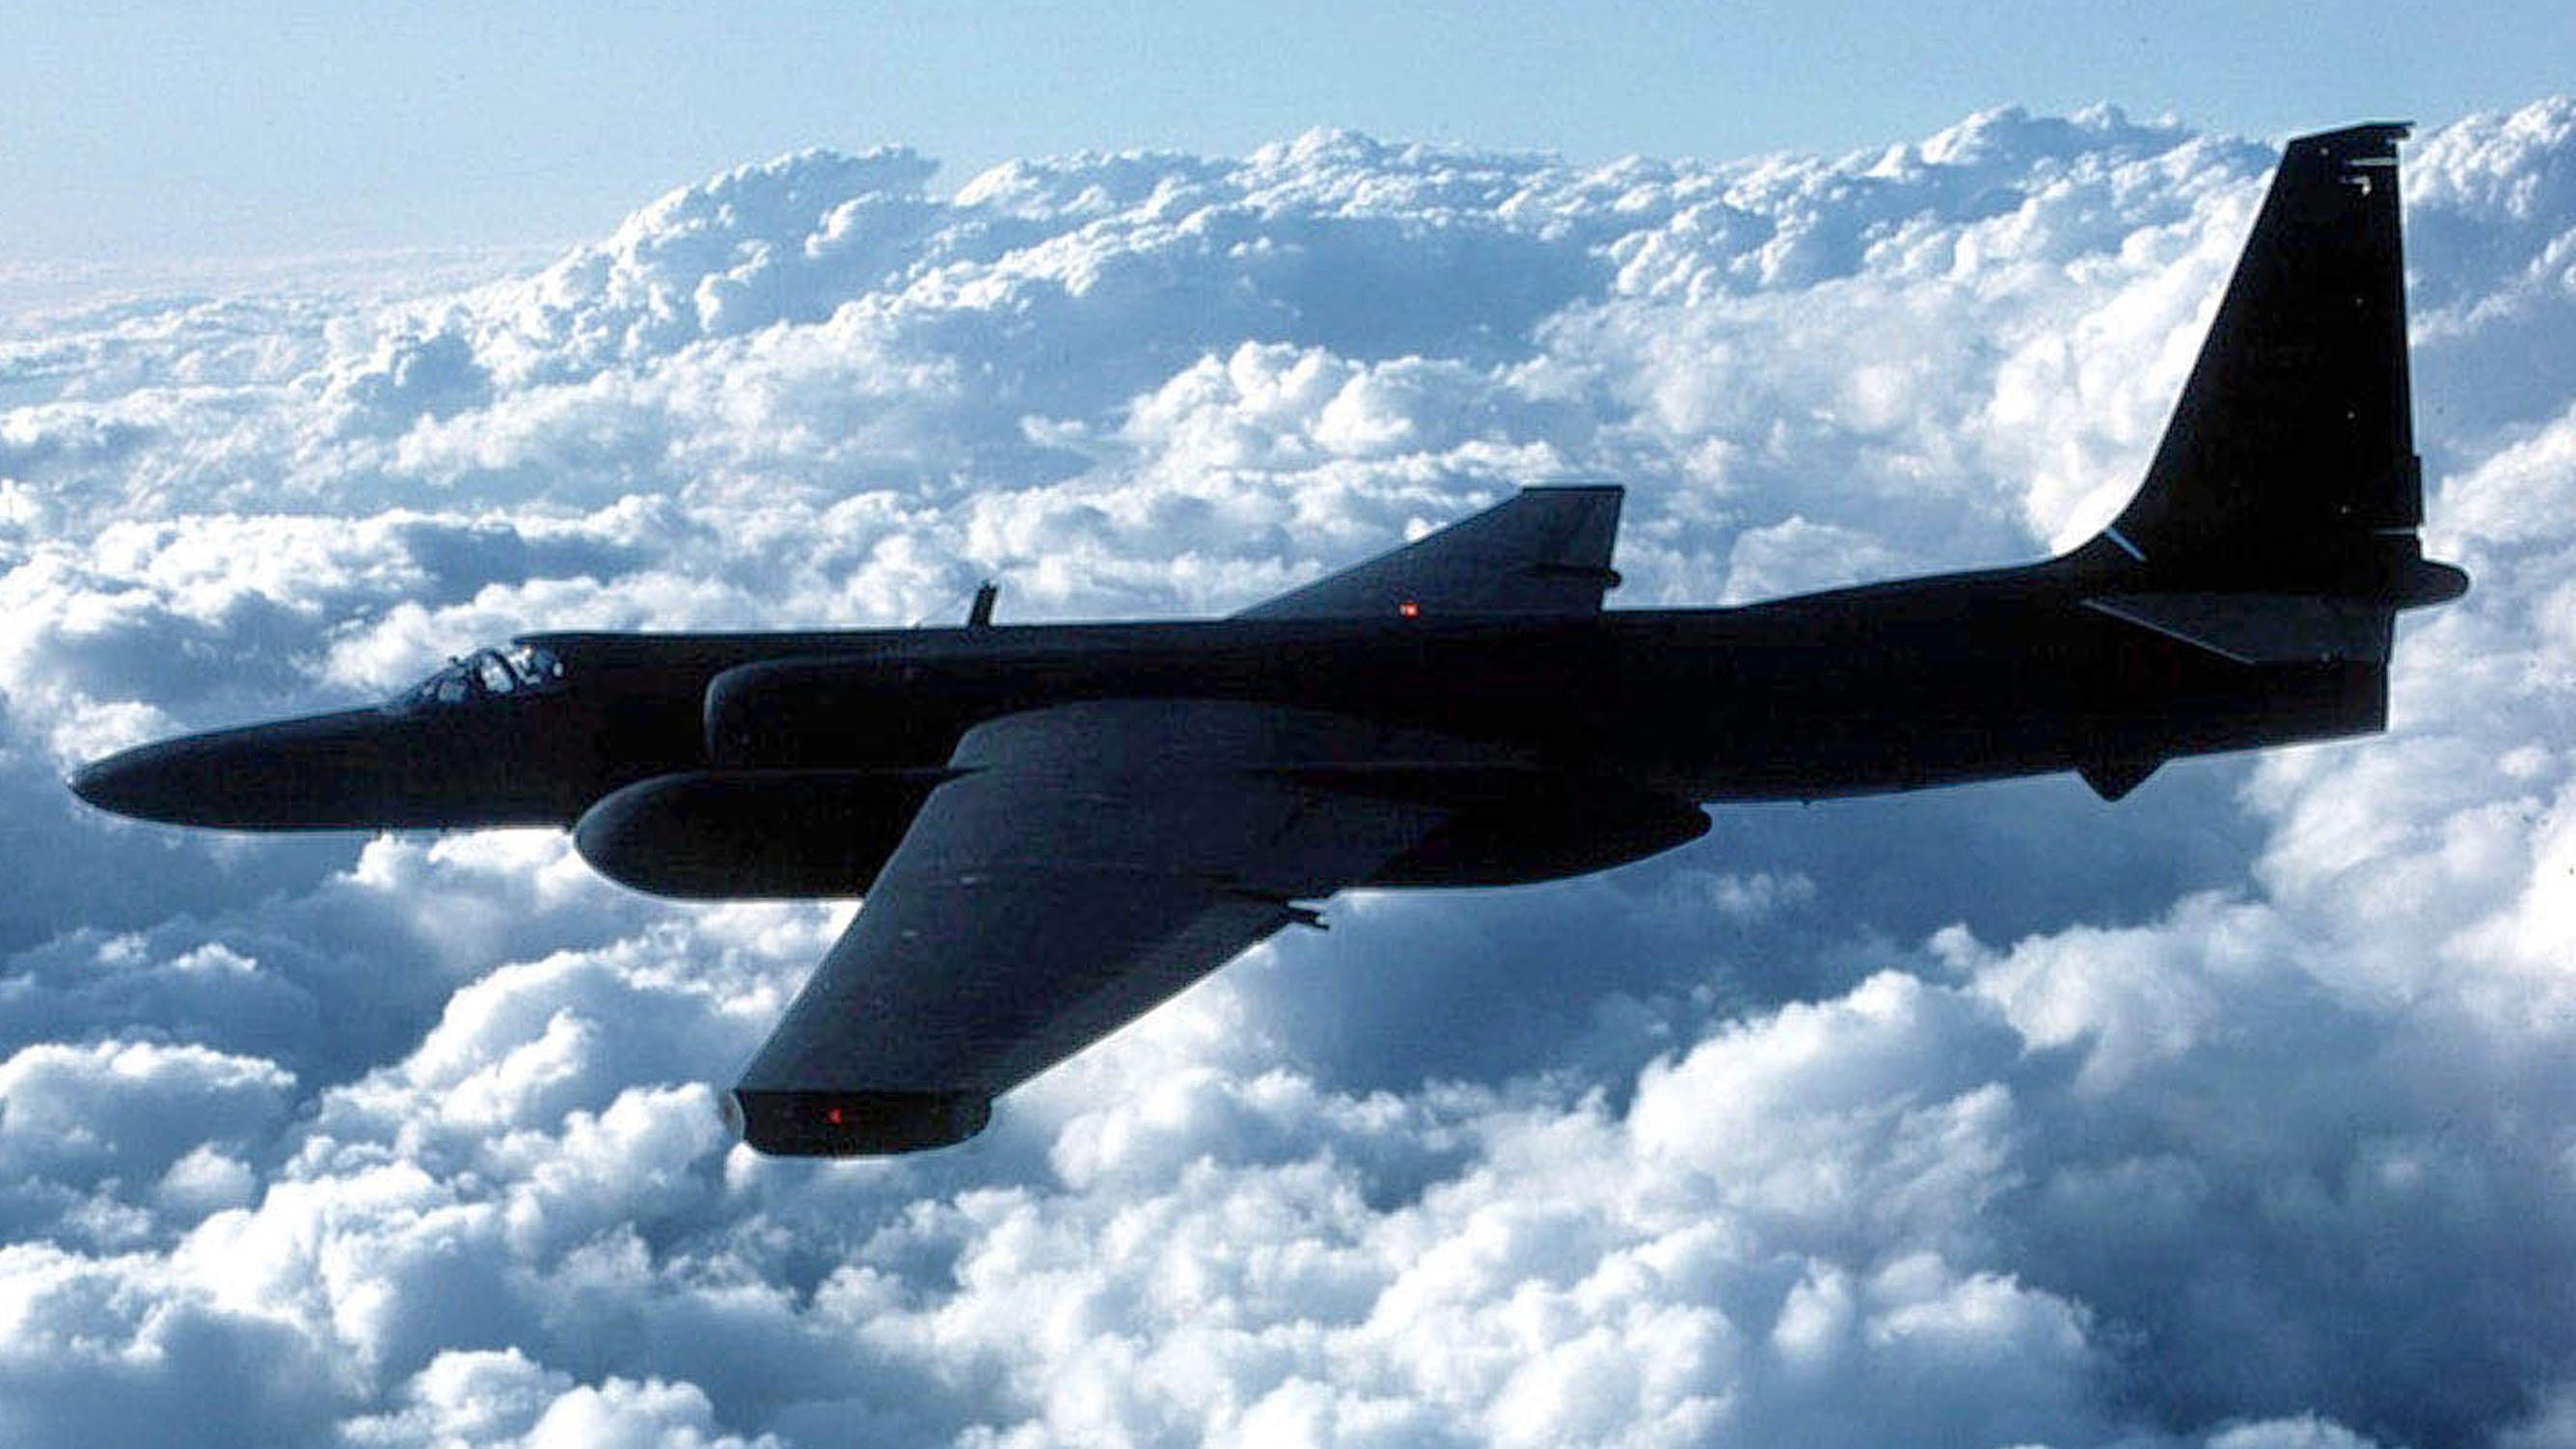 U-2 Spy Plane Disrupted Hundreds Of Flights, FAA Acknowledges